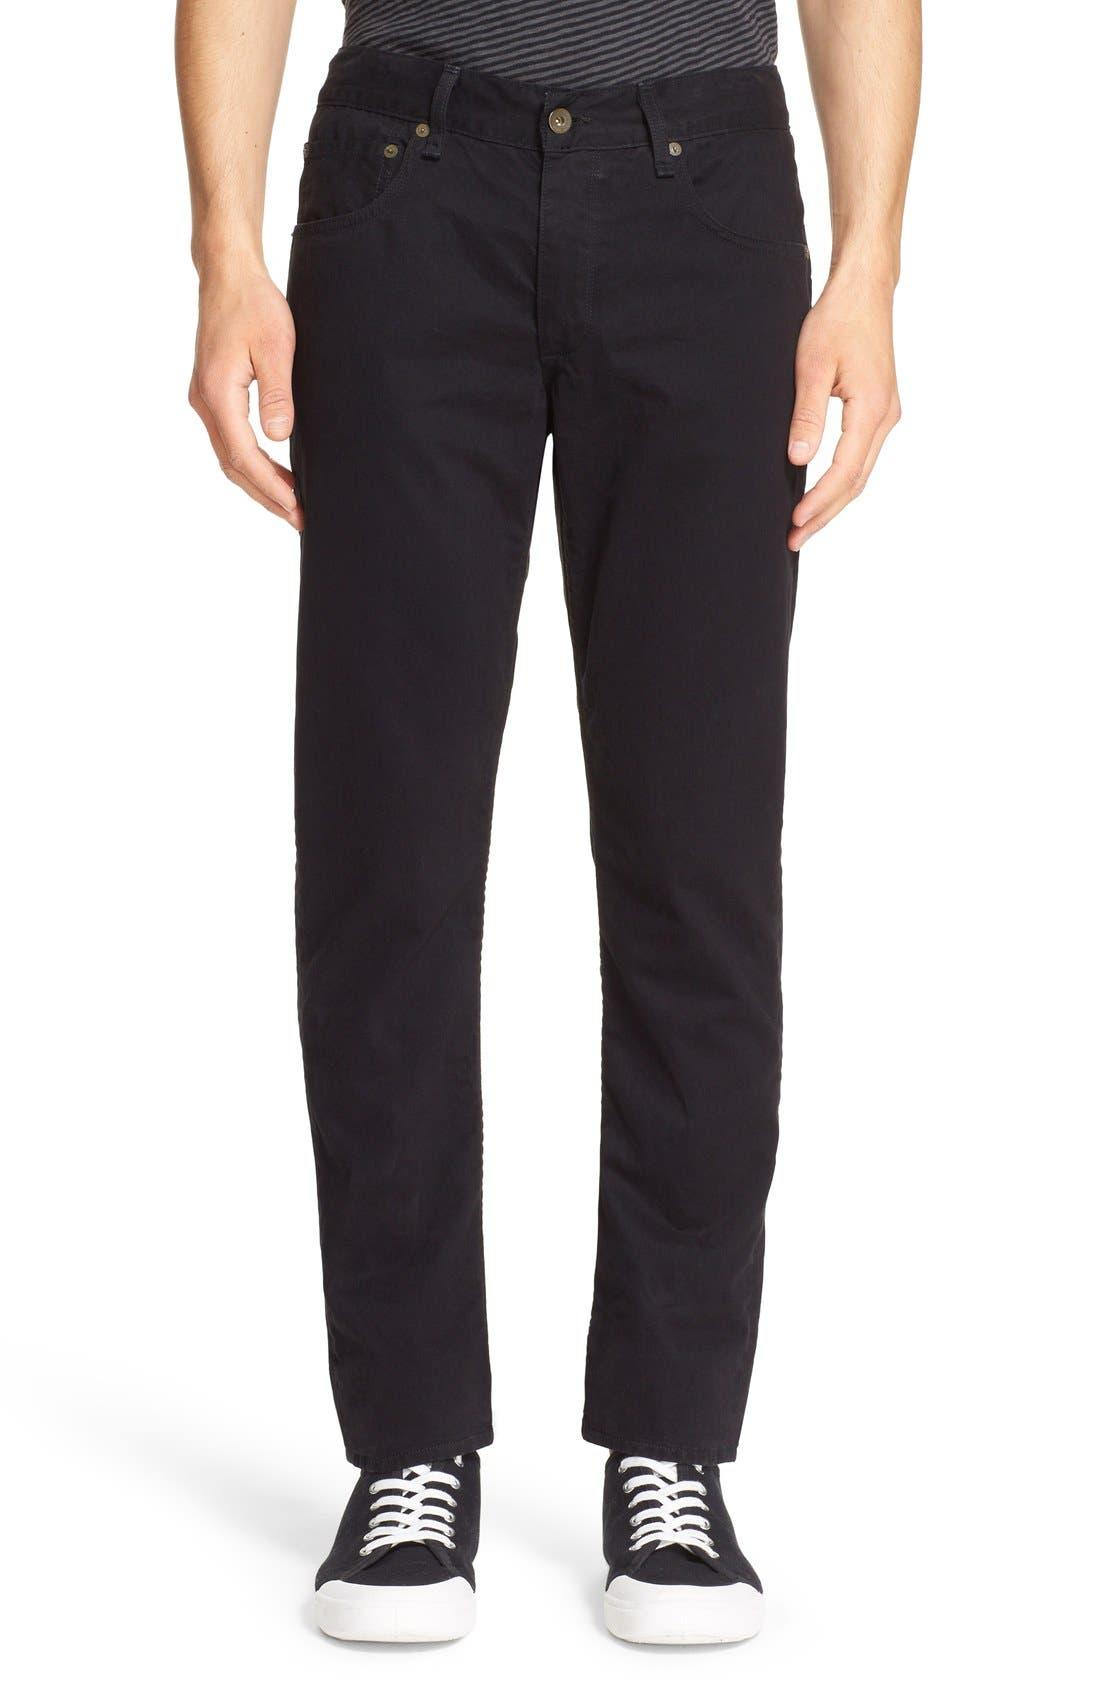 'Fit 2' Cotton Twill Pants,                         Main,                         color, 001